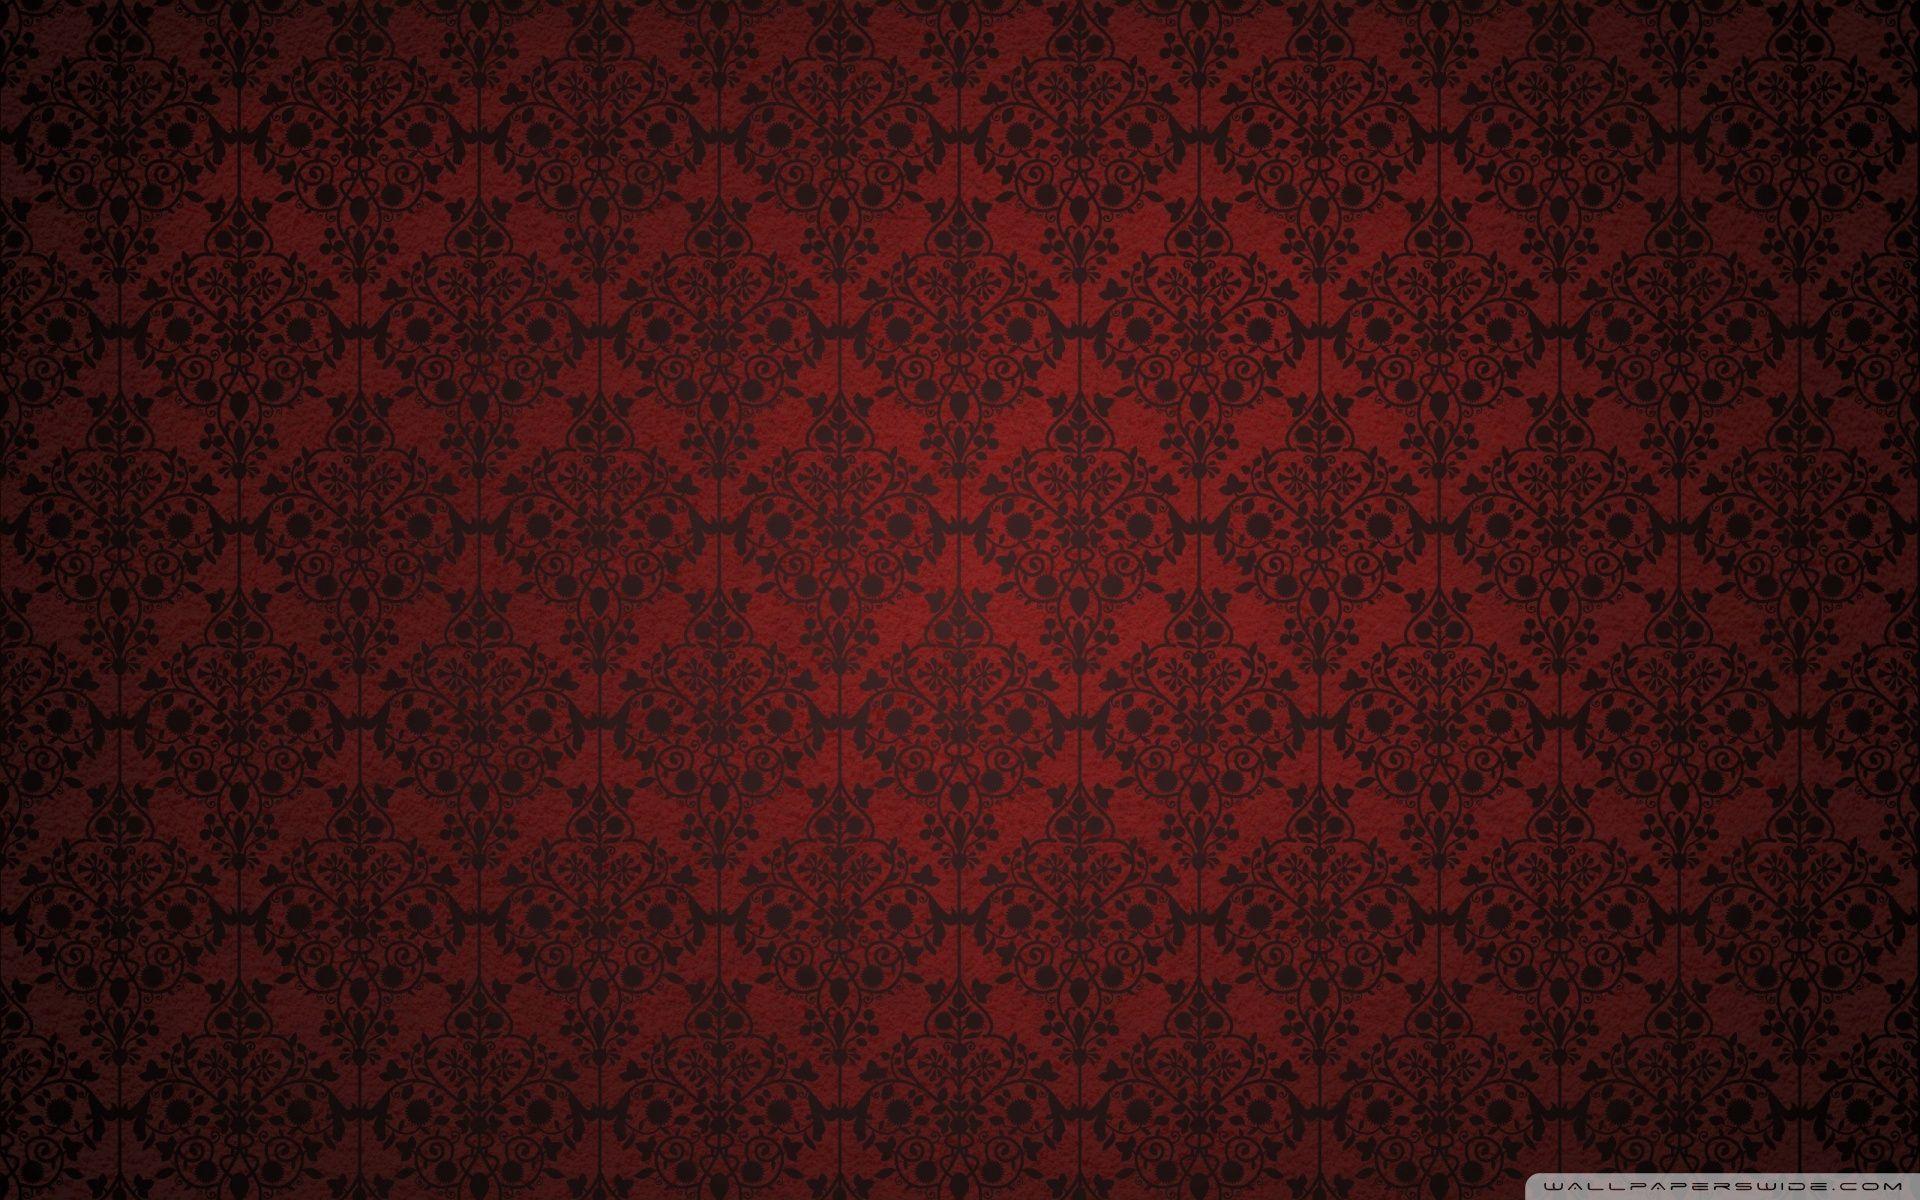 Red Damask Hd Desktop Wallpaper High Definition Fullscreen Red Wallpaper Red Damask Digital Wallpaper